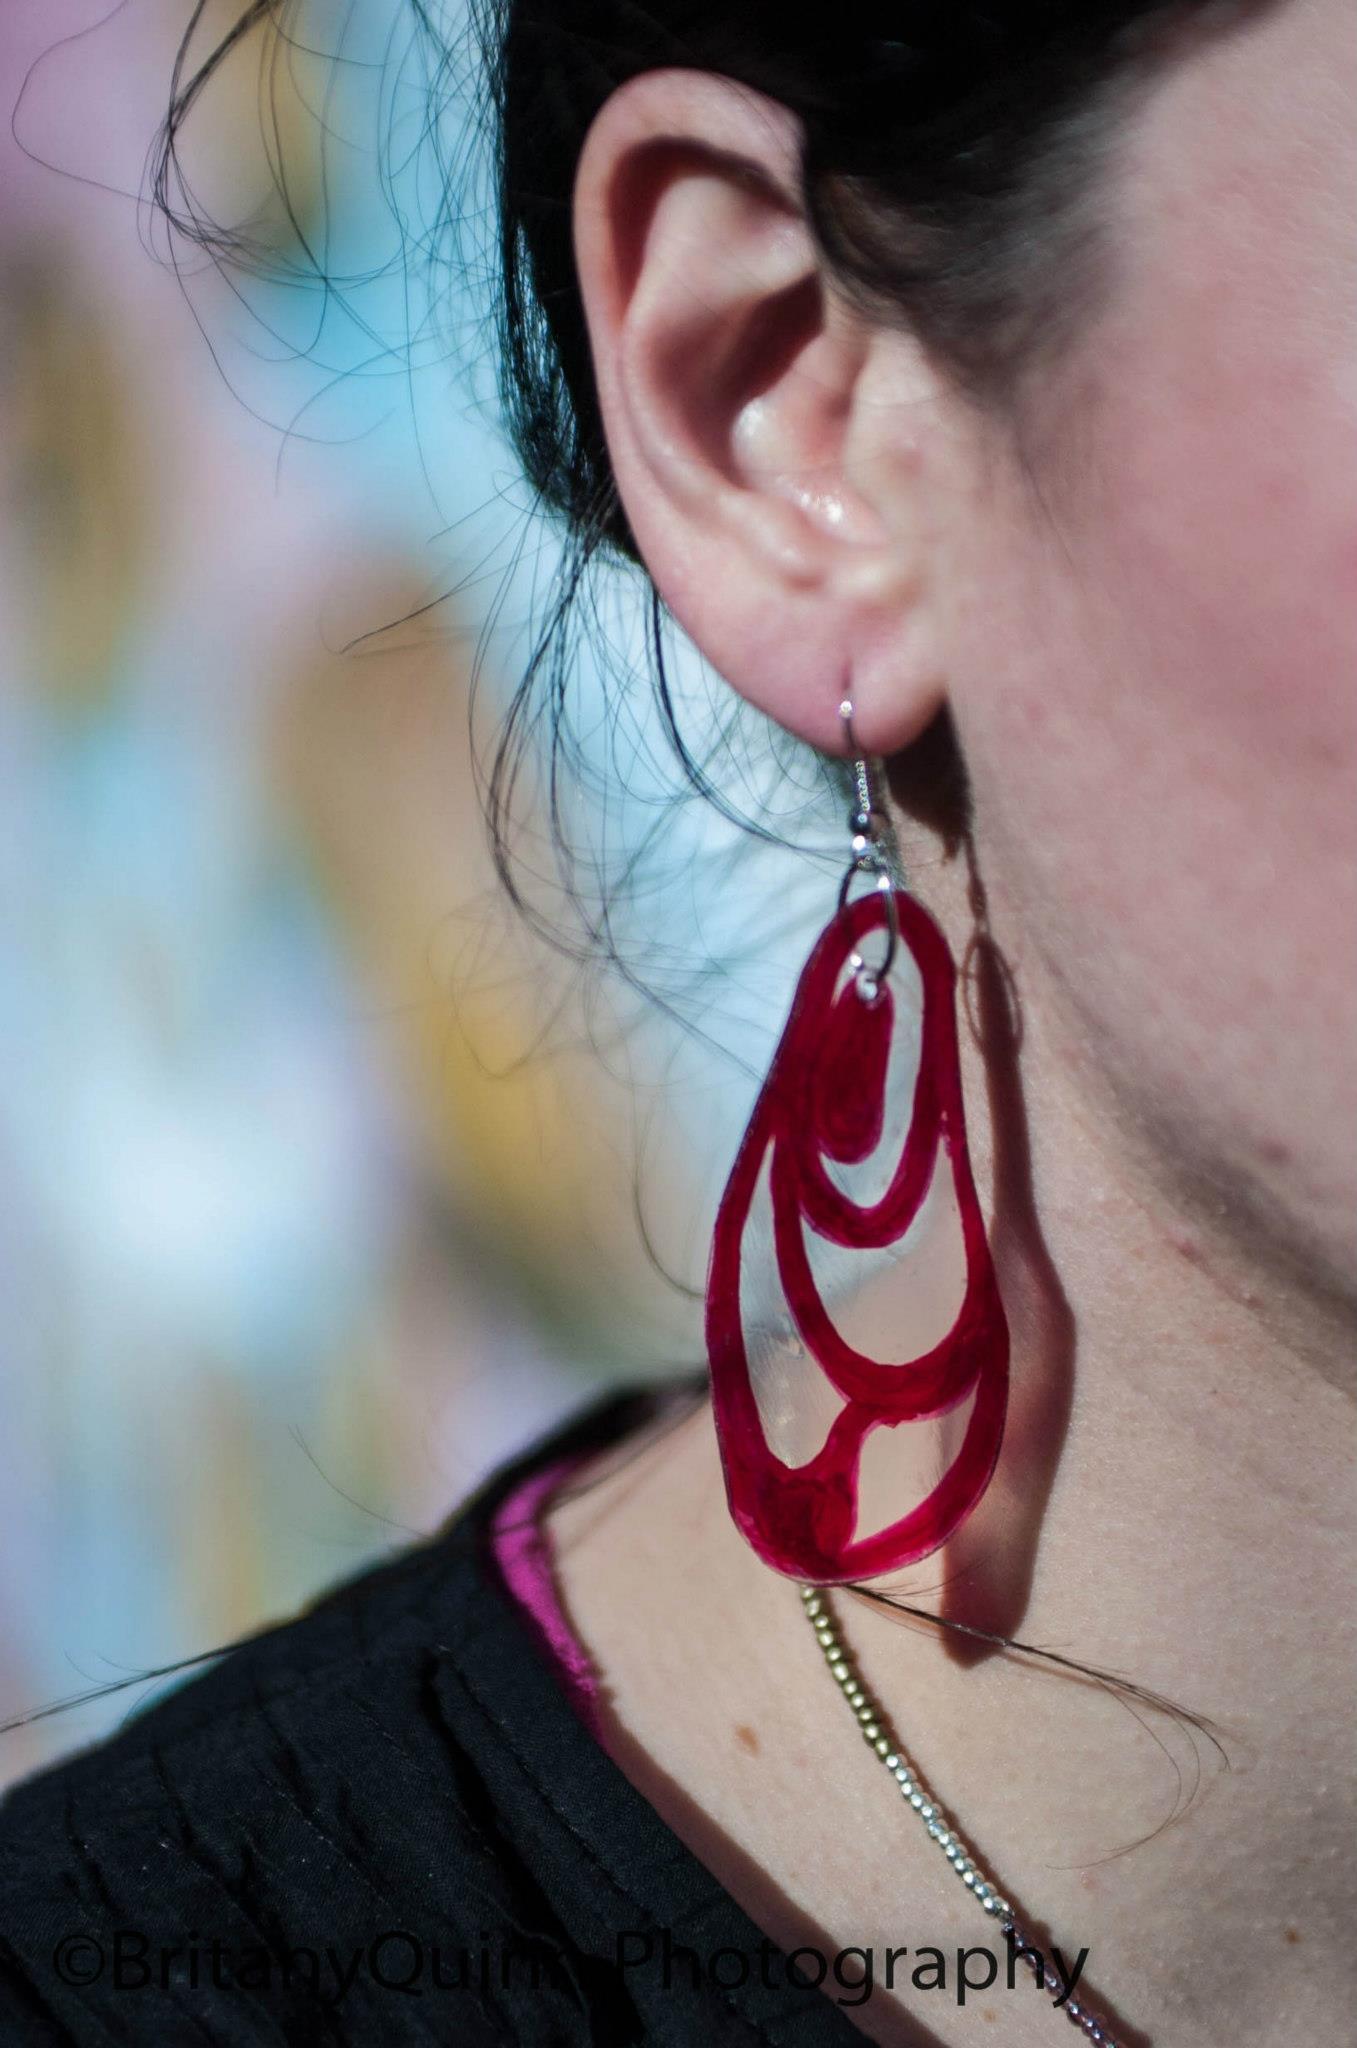 REcycled Plastic Earrings